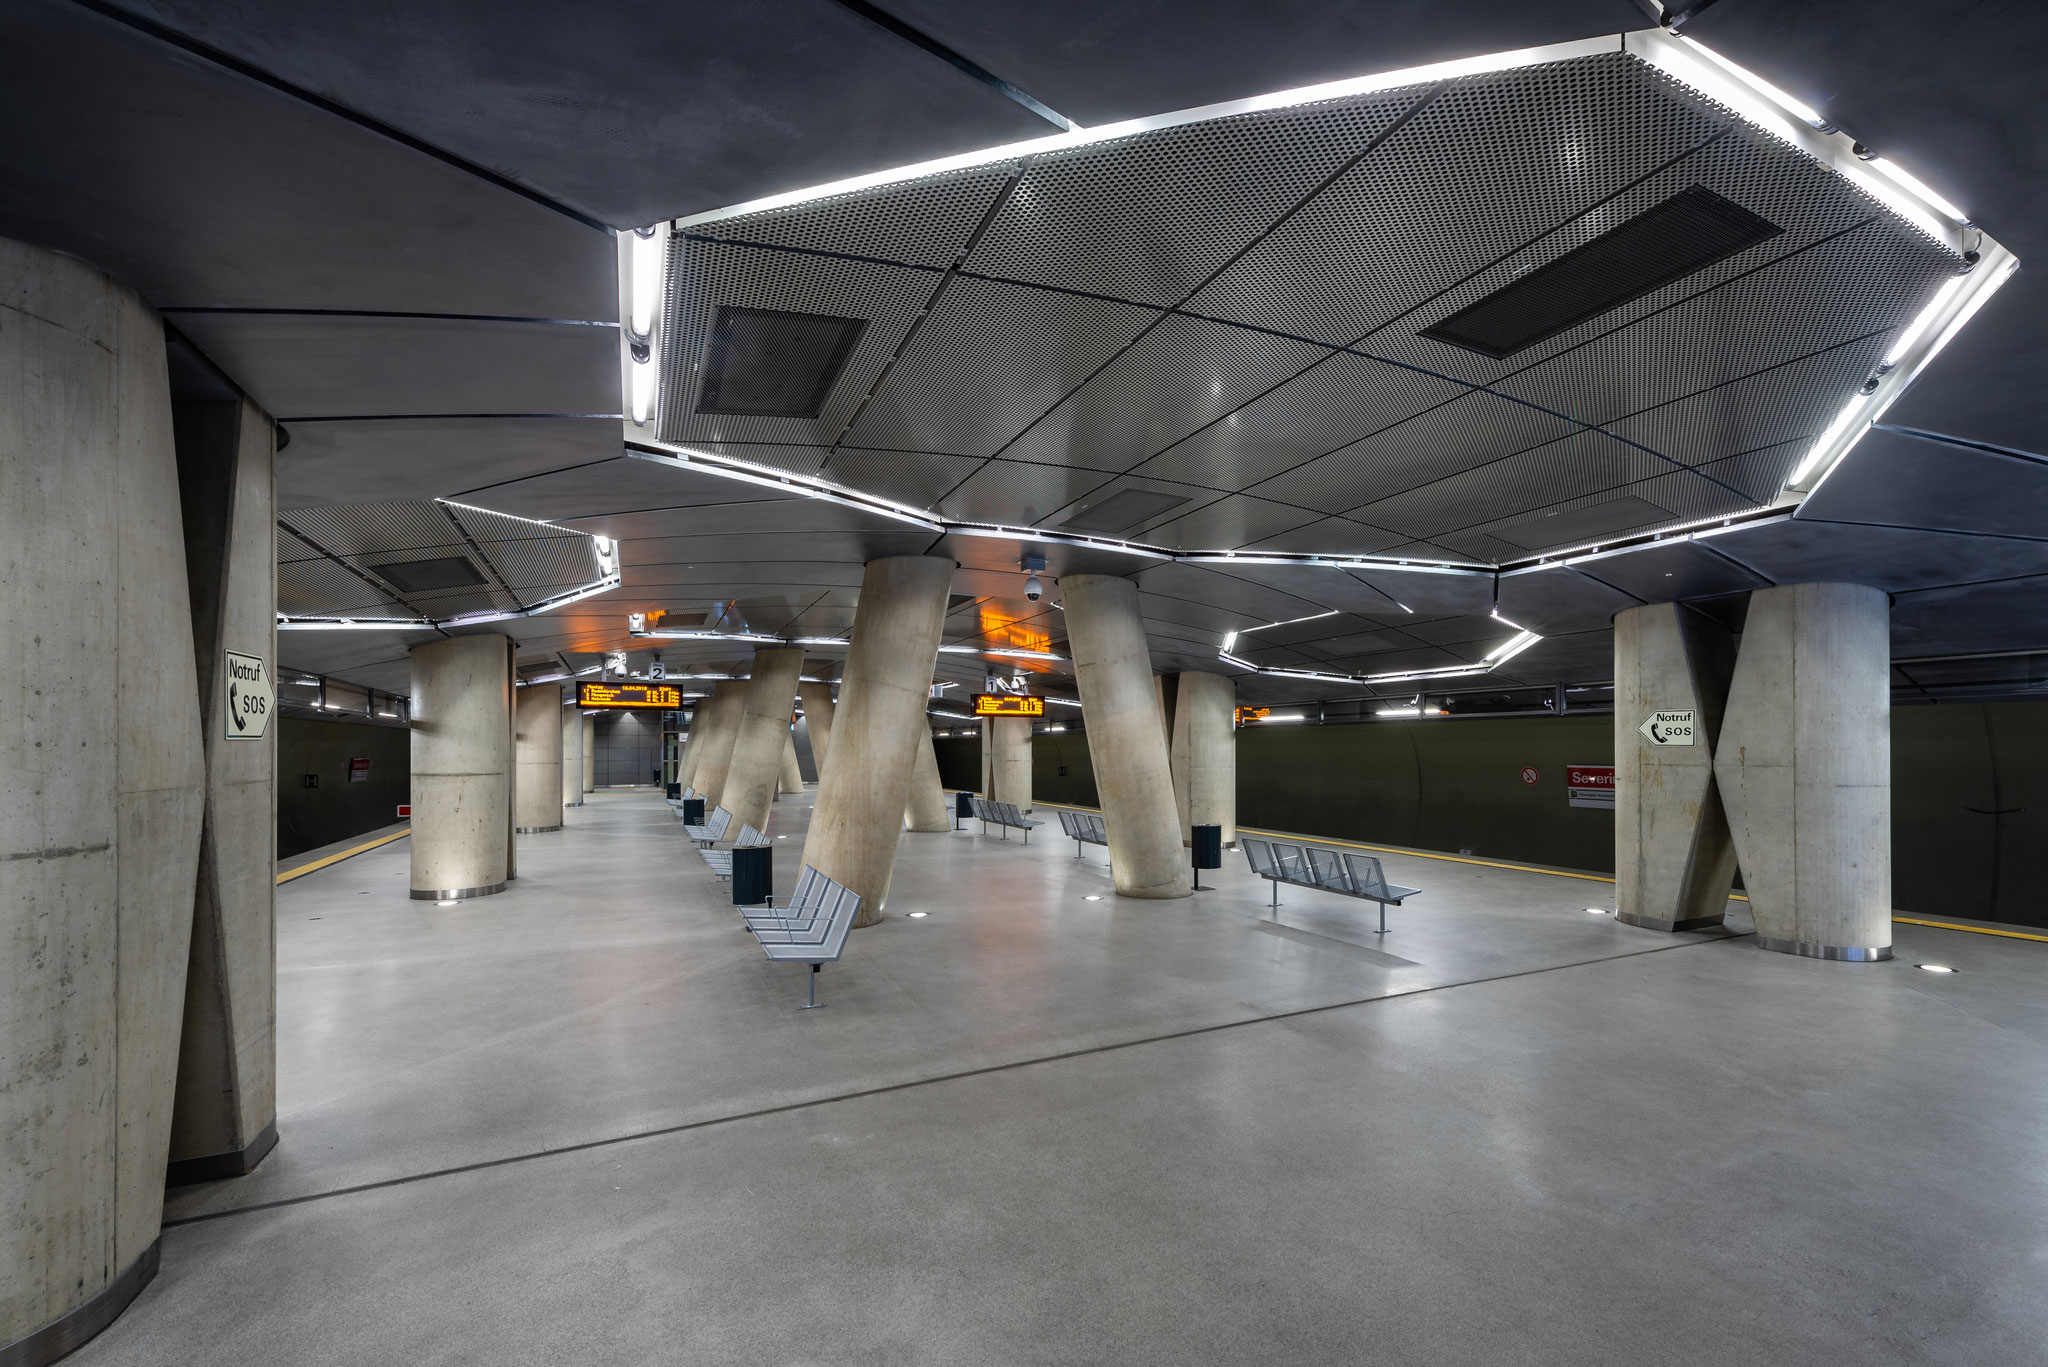 Architektur Fotografie im U Bahnhof Severinstrasse Köln